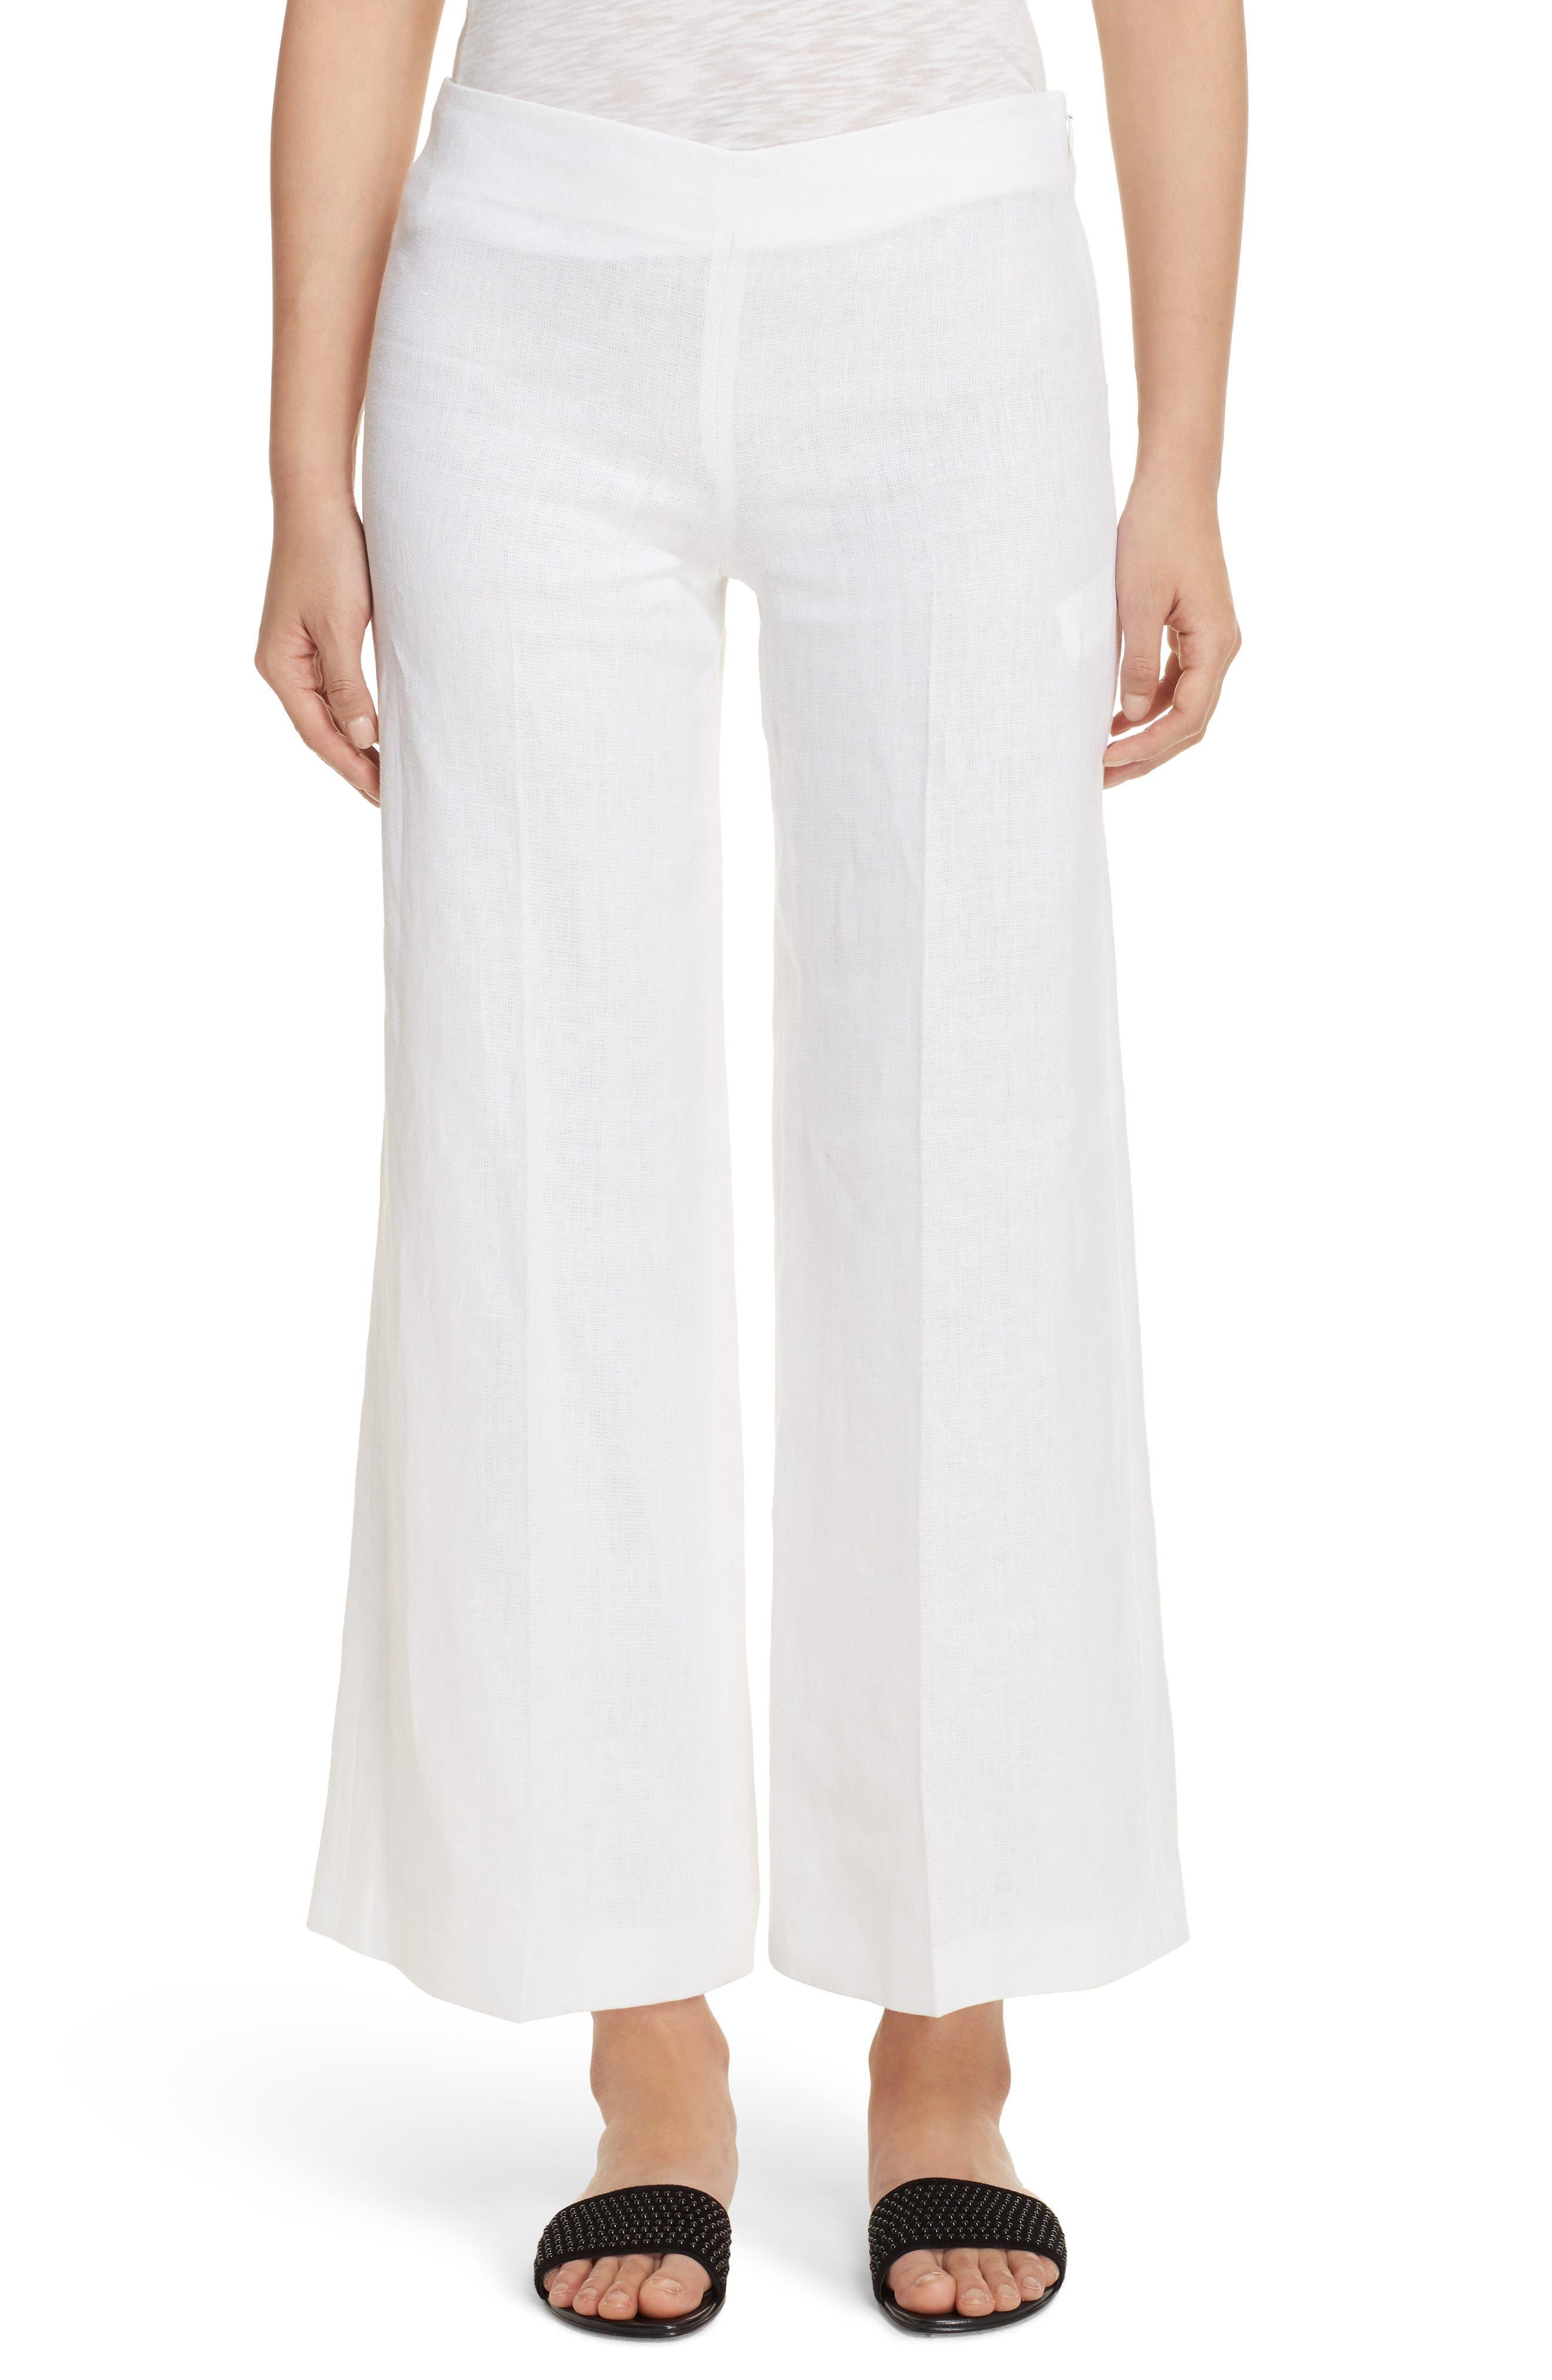 Terena B Linen Wide Leg Pants,                             Main thumbnail 1, color,                             White